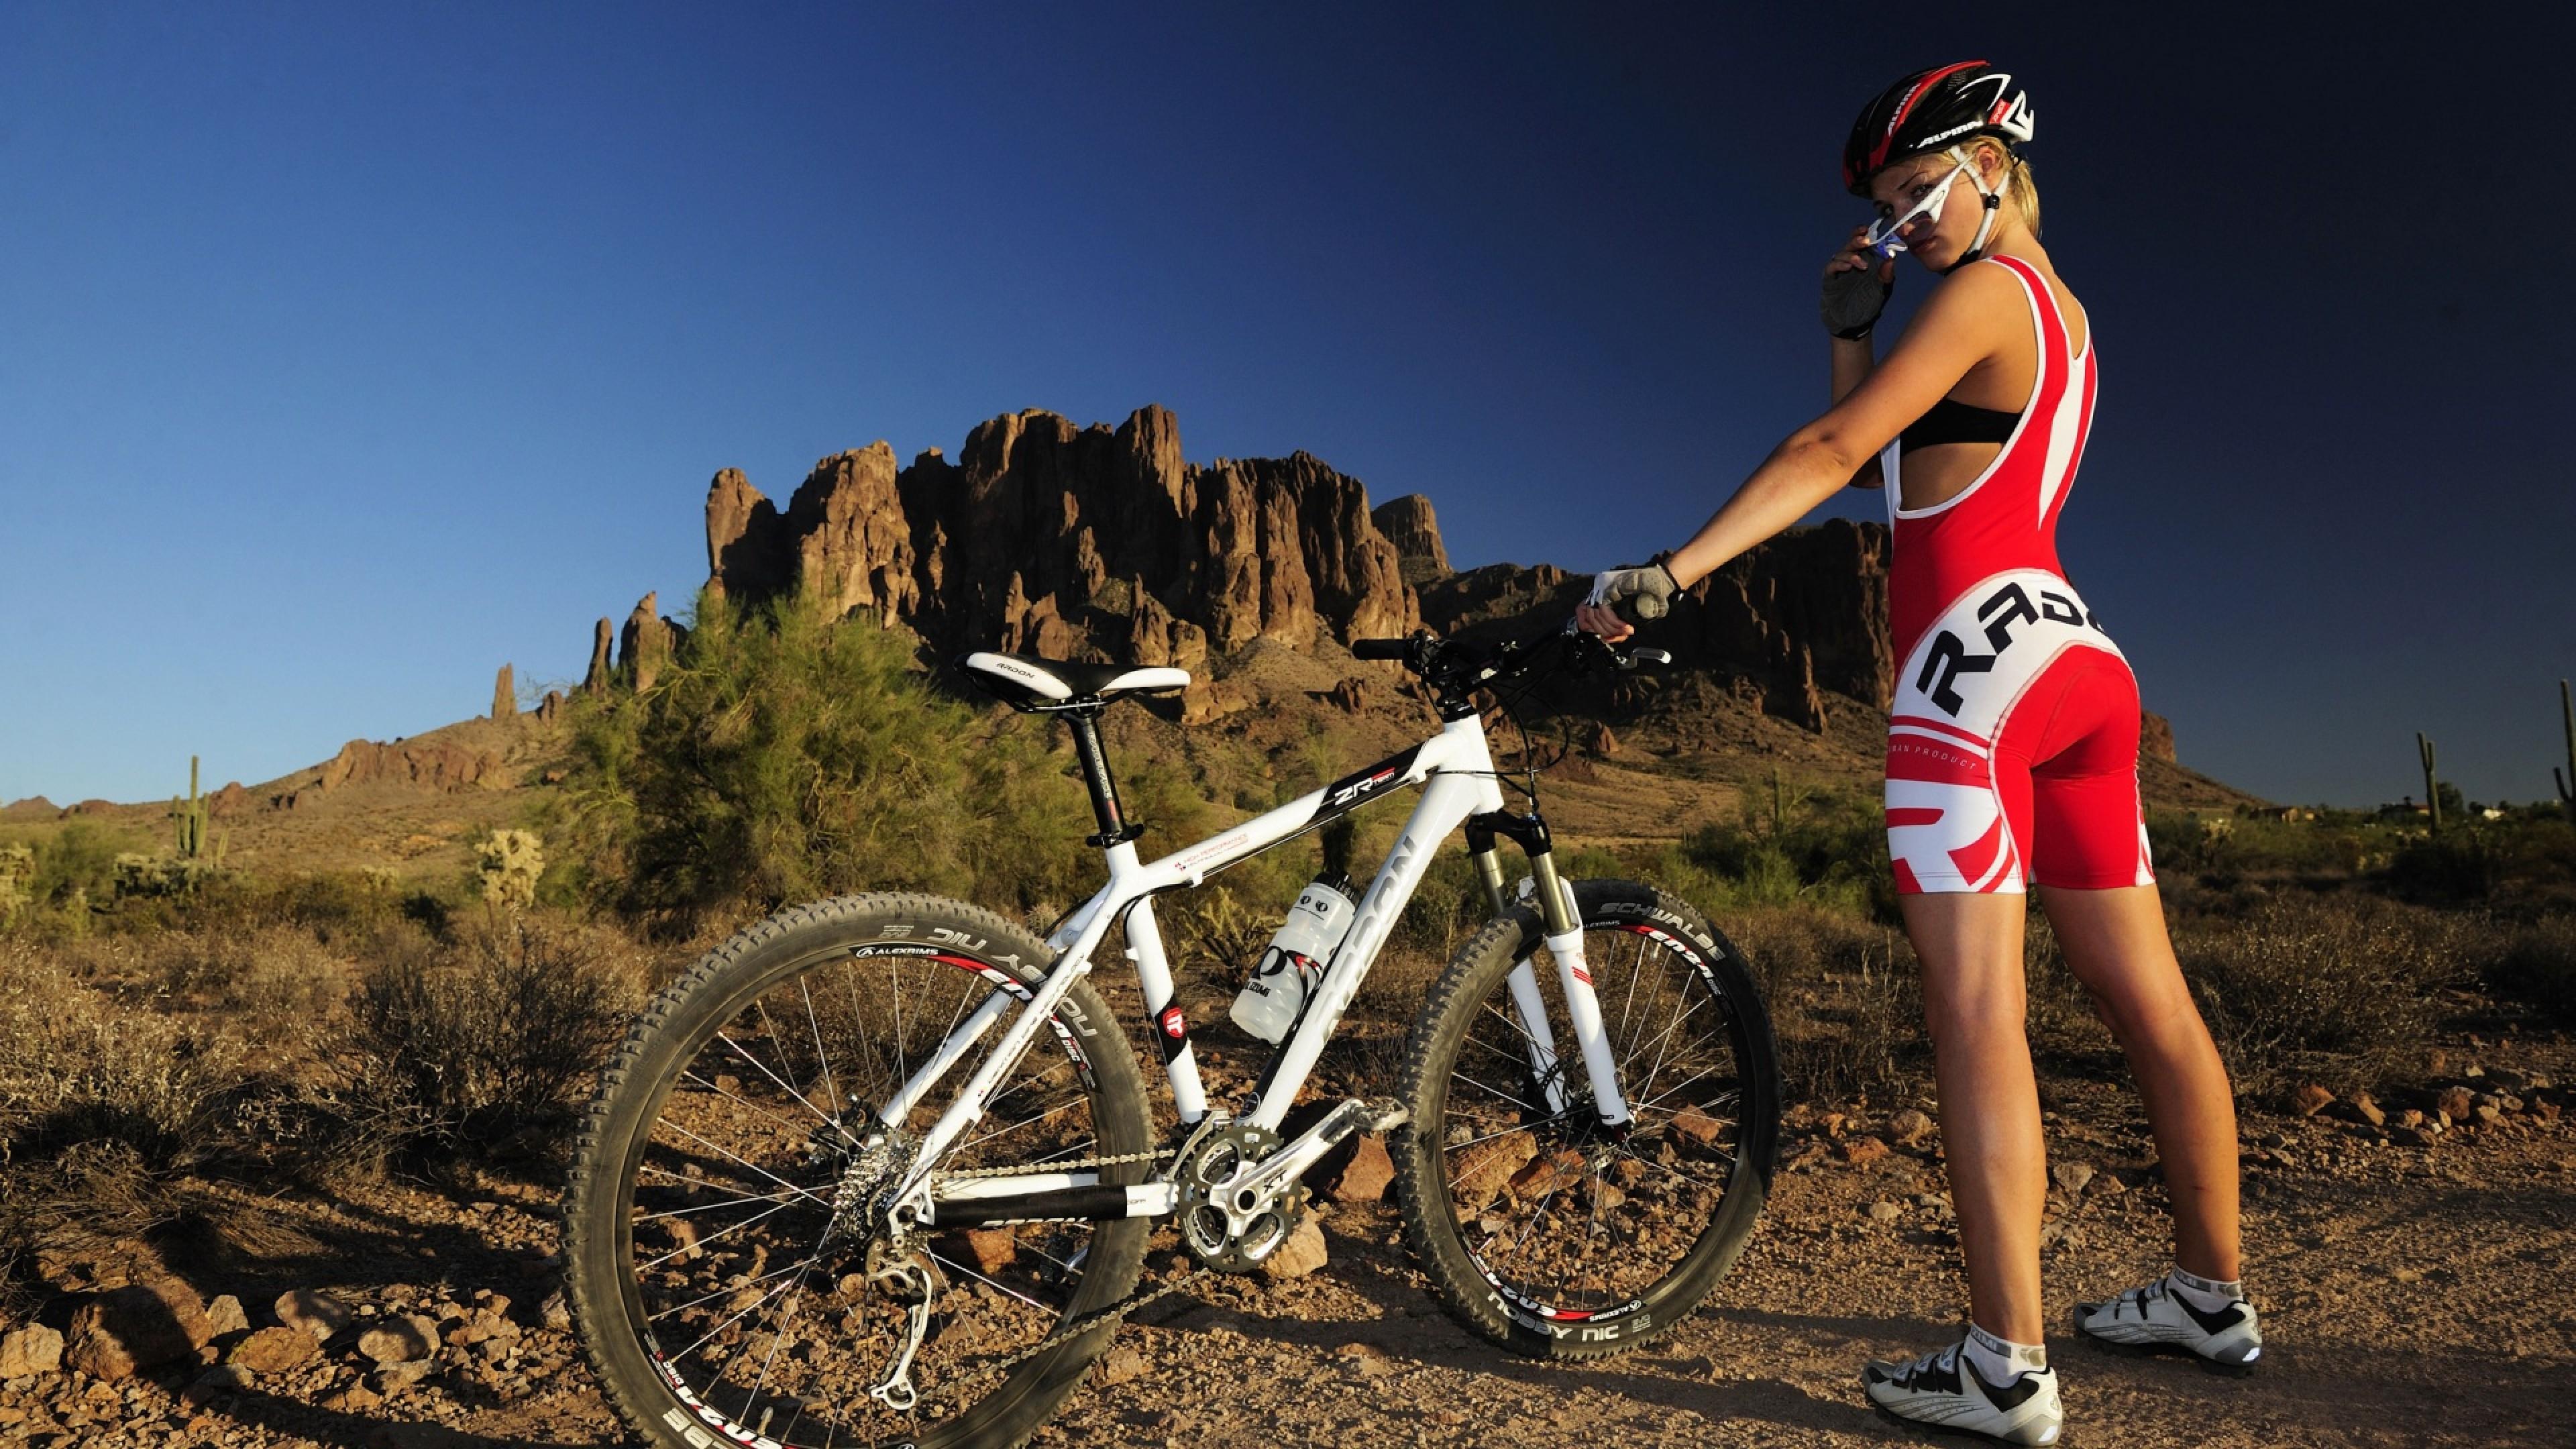 Hd Wallpaper Mtb Mountainbike Girl And Bike Wallpapers Trend